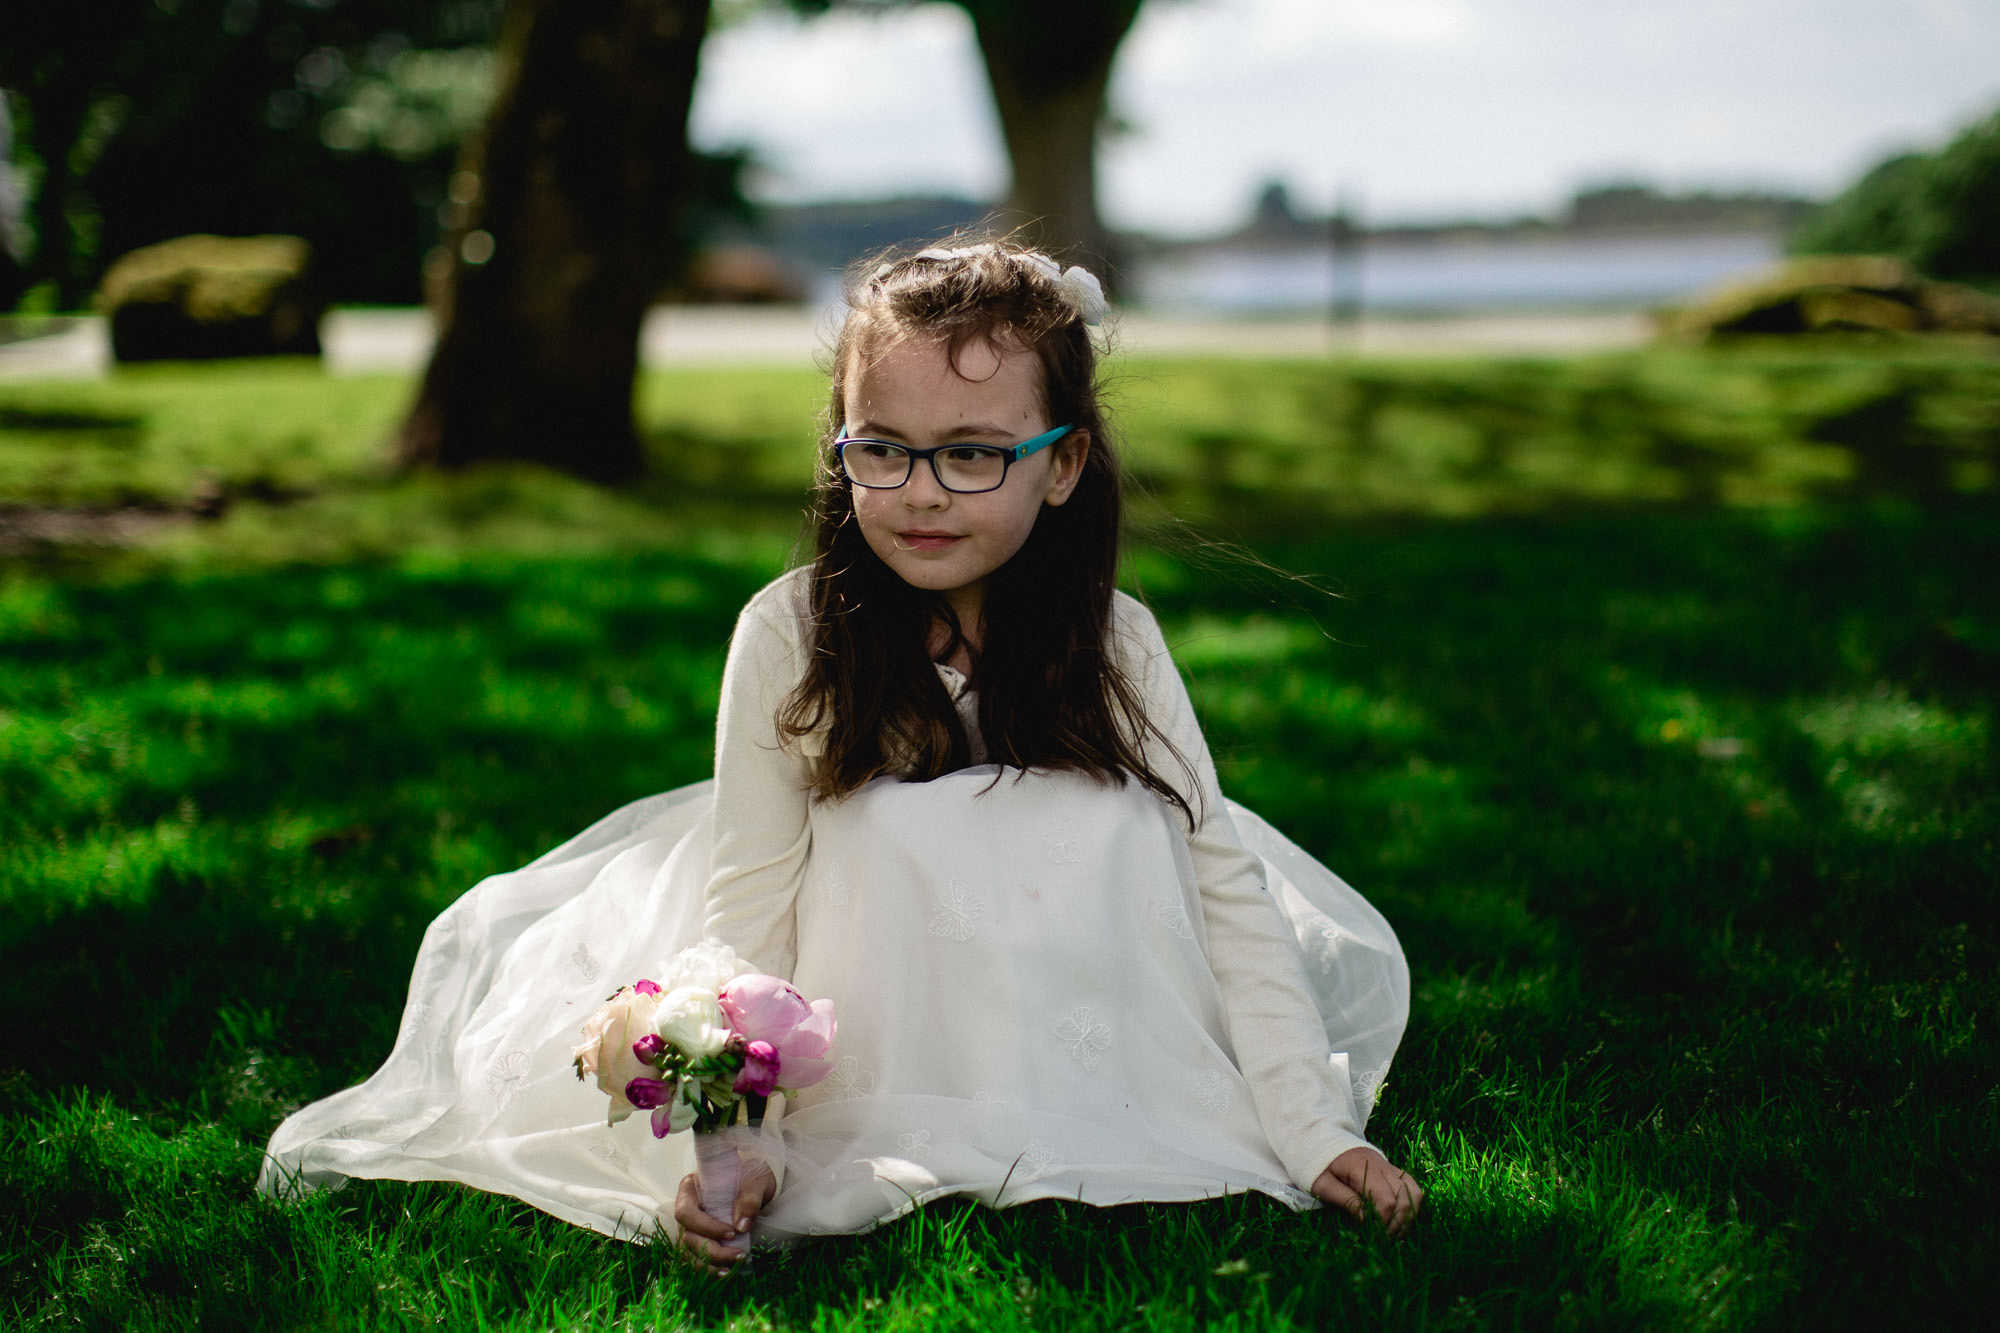 CLAIREBYRNEPHOTOGRAPHY-WEDDING-Ireland-tulffaris-alternative-fun-Lisa-terry-22.jpg